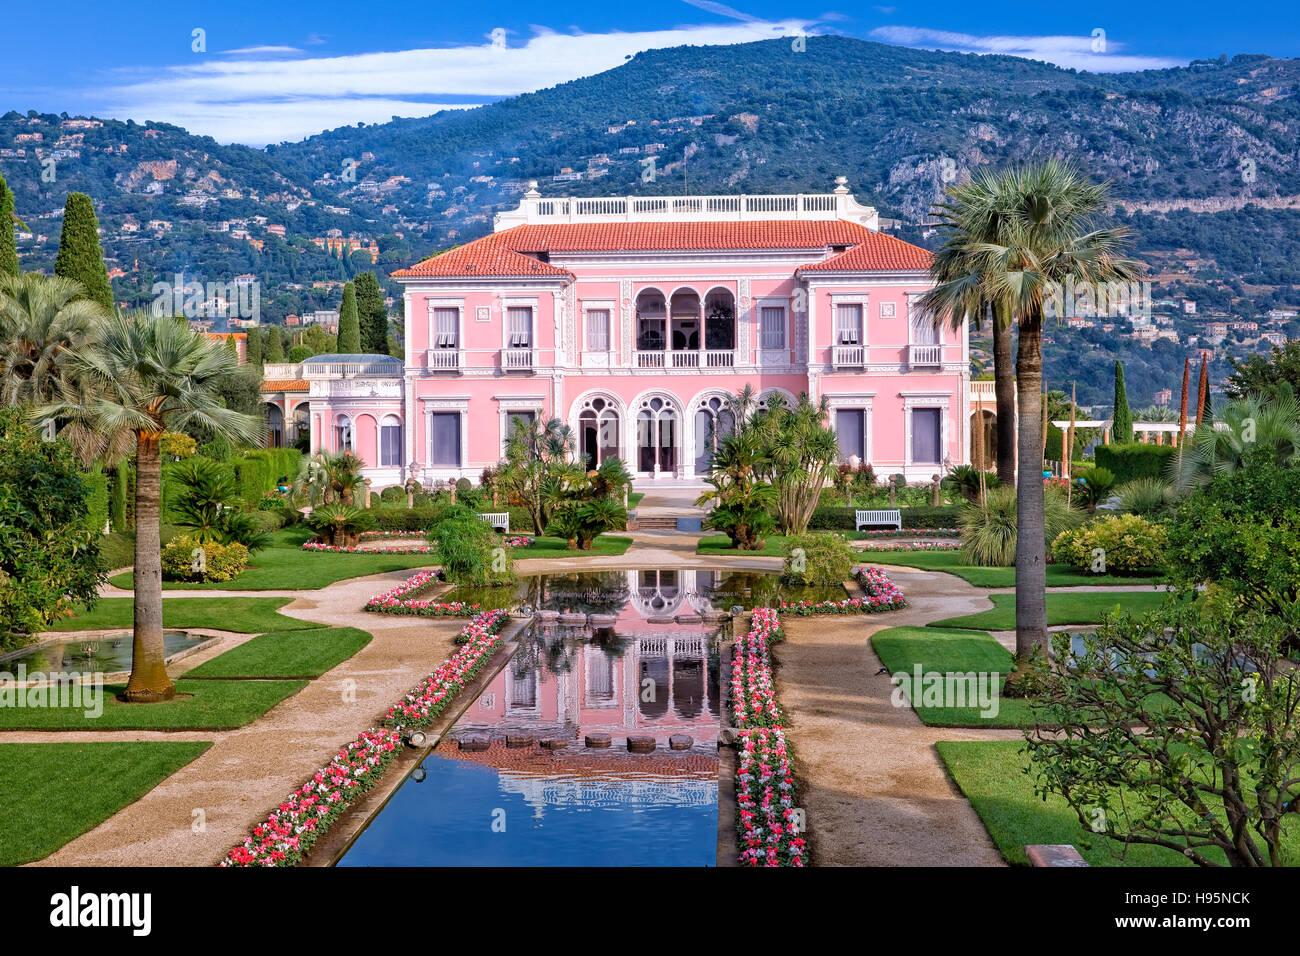 Villa Ephrussi de Rothschild in St Jean Cap Ferrat, France - Stock Image